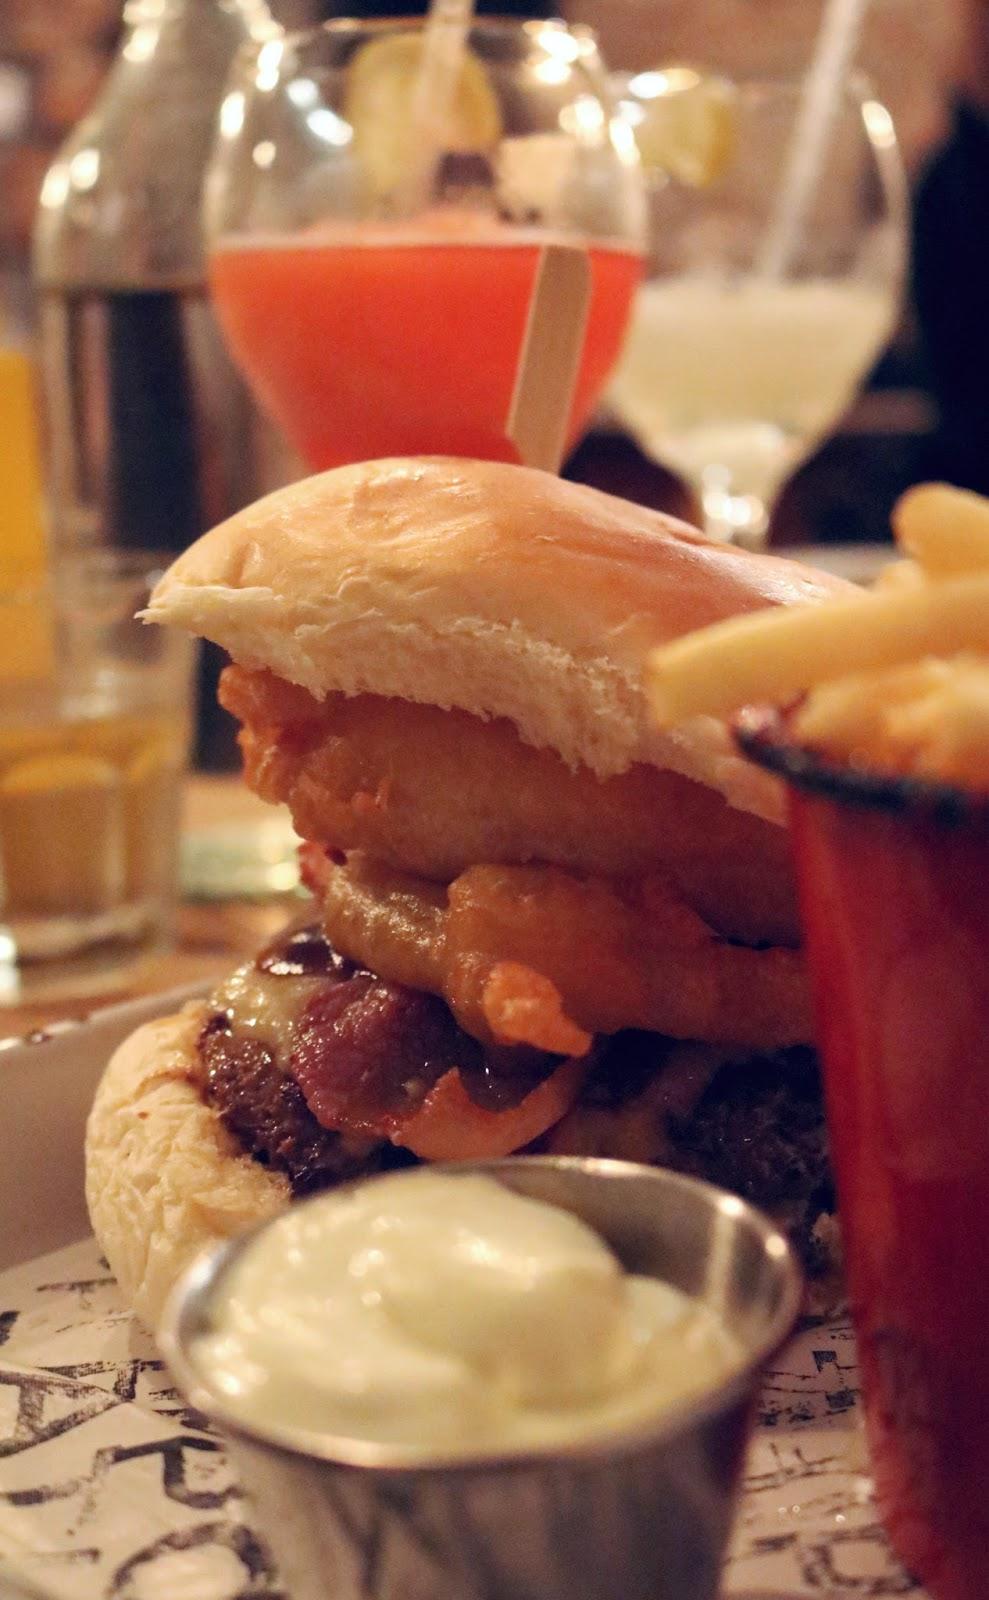 Texas Burger at Fat Hippo Underground